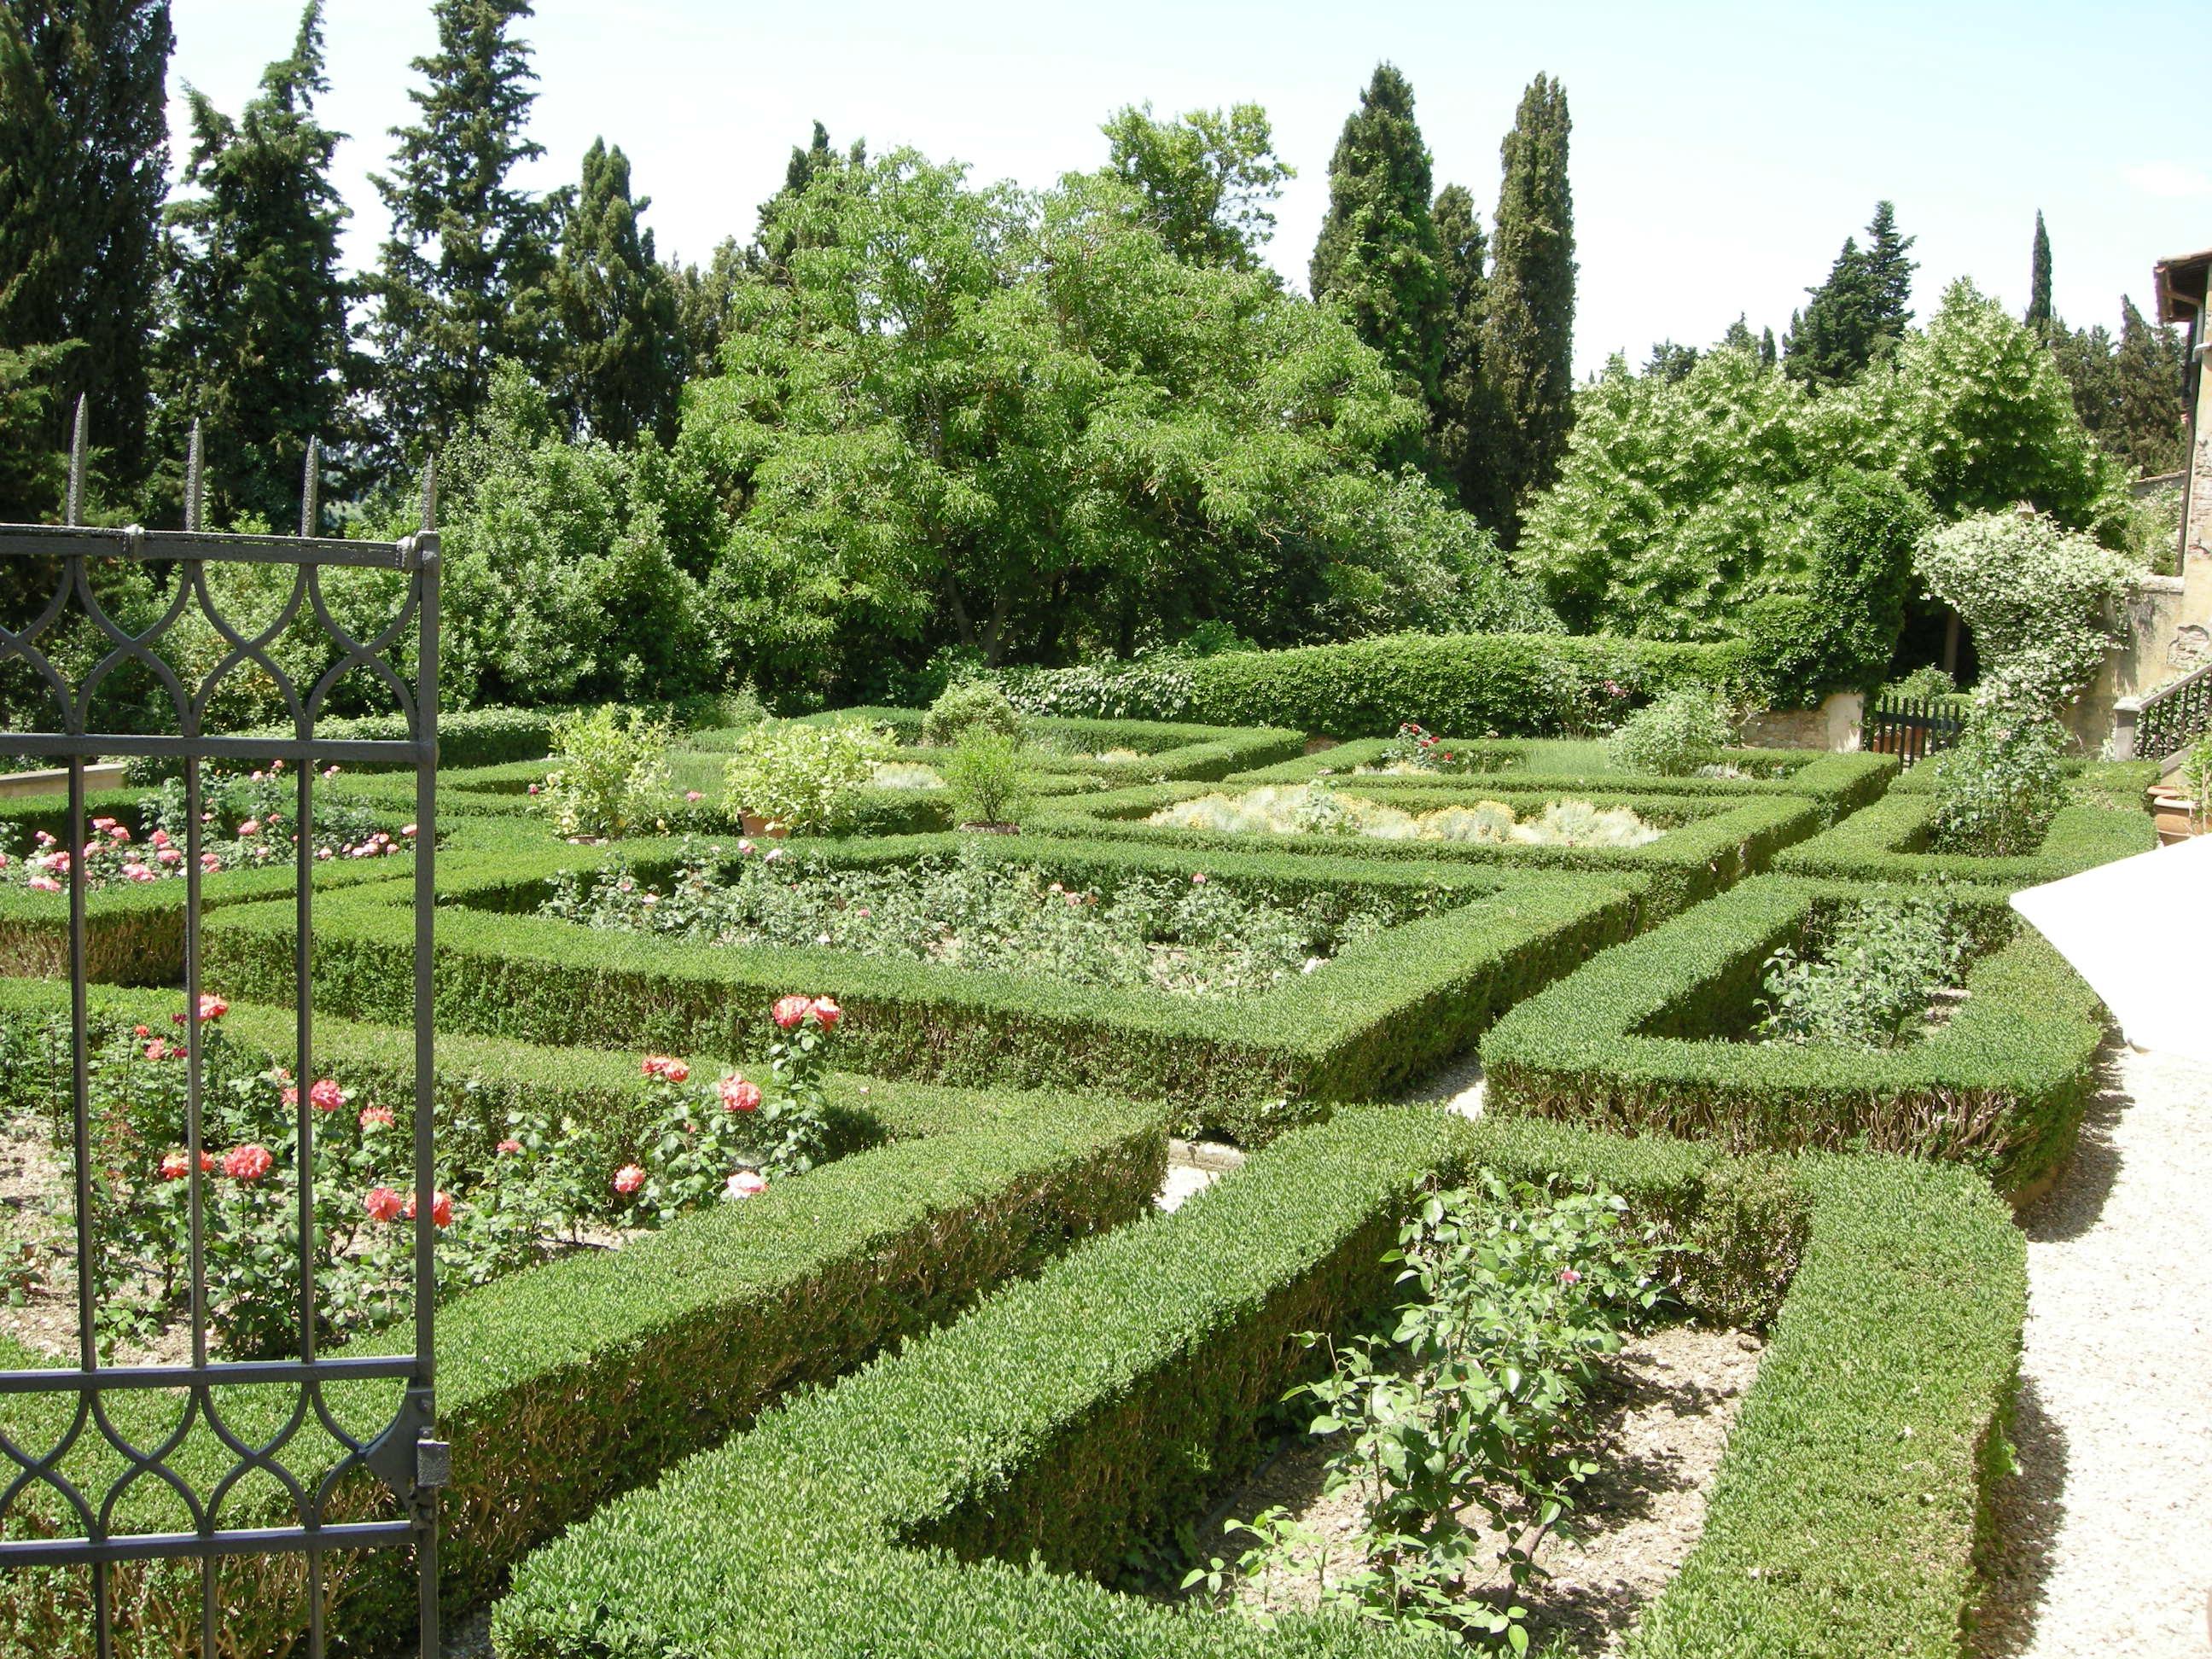 File villa badasseroni giardino all 39 italiana 01 jpg - Giardino all italiana ...